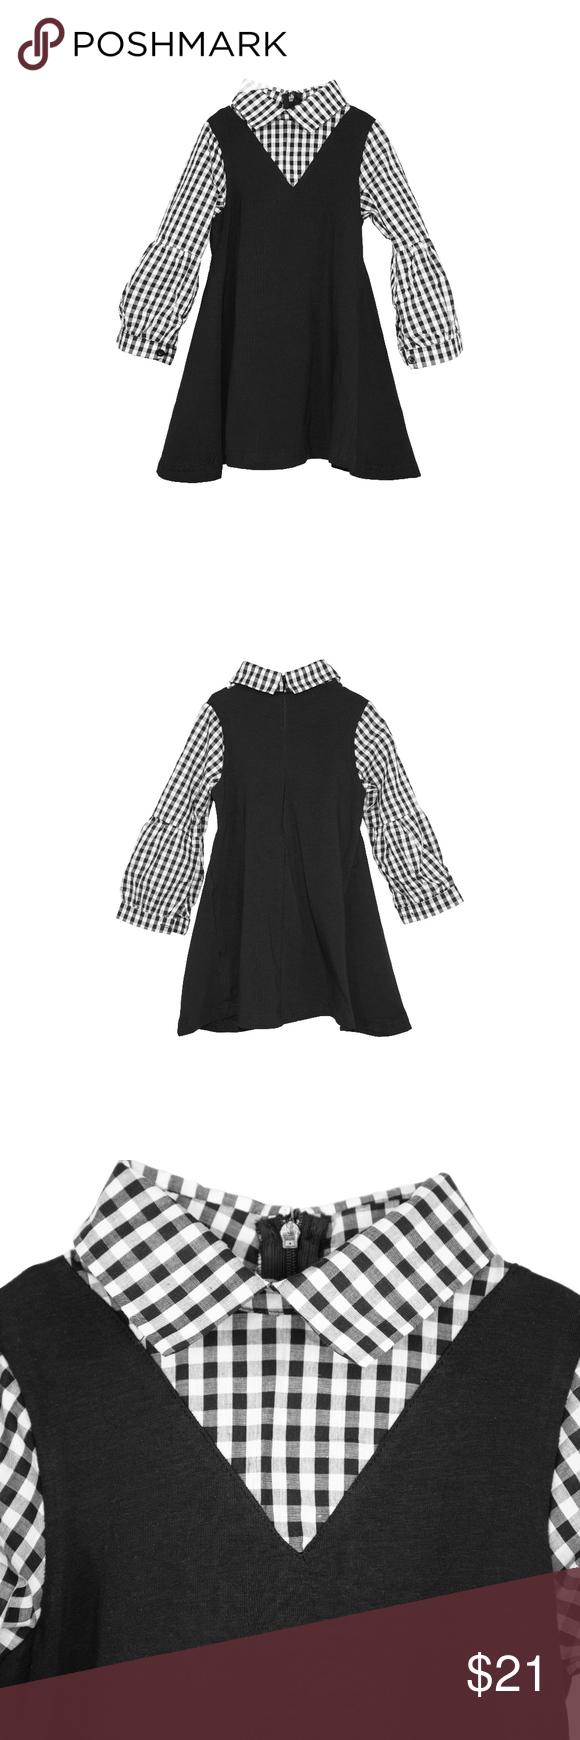 Toddler girlsu simple black plaid fer dress boutique my posh